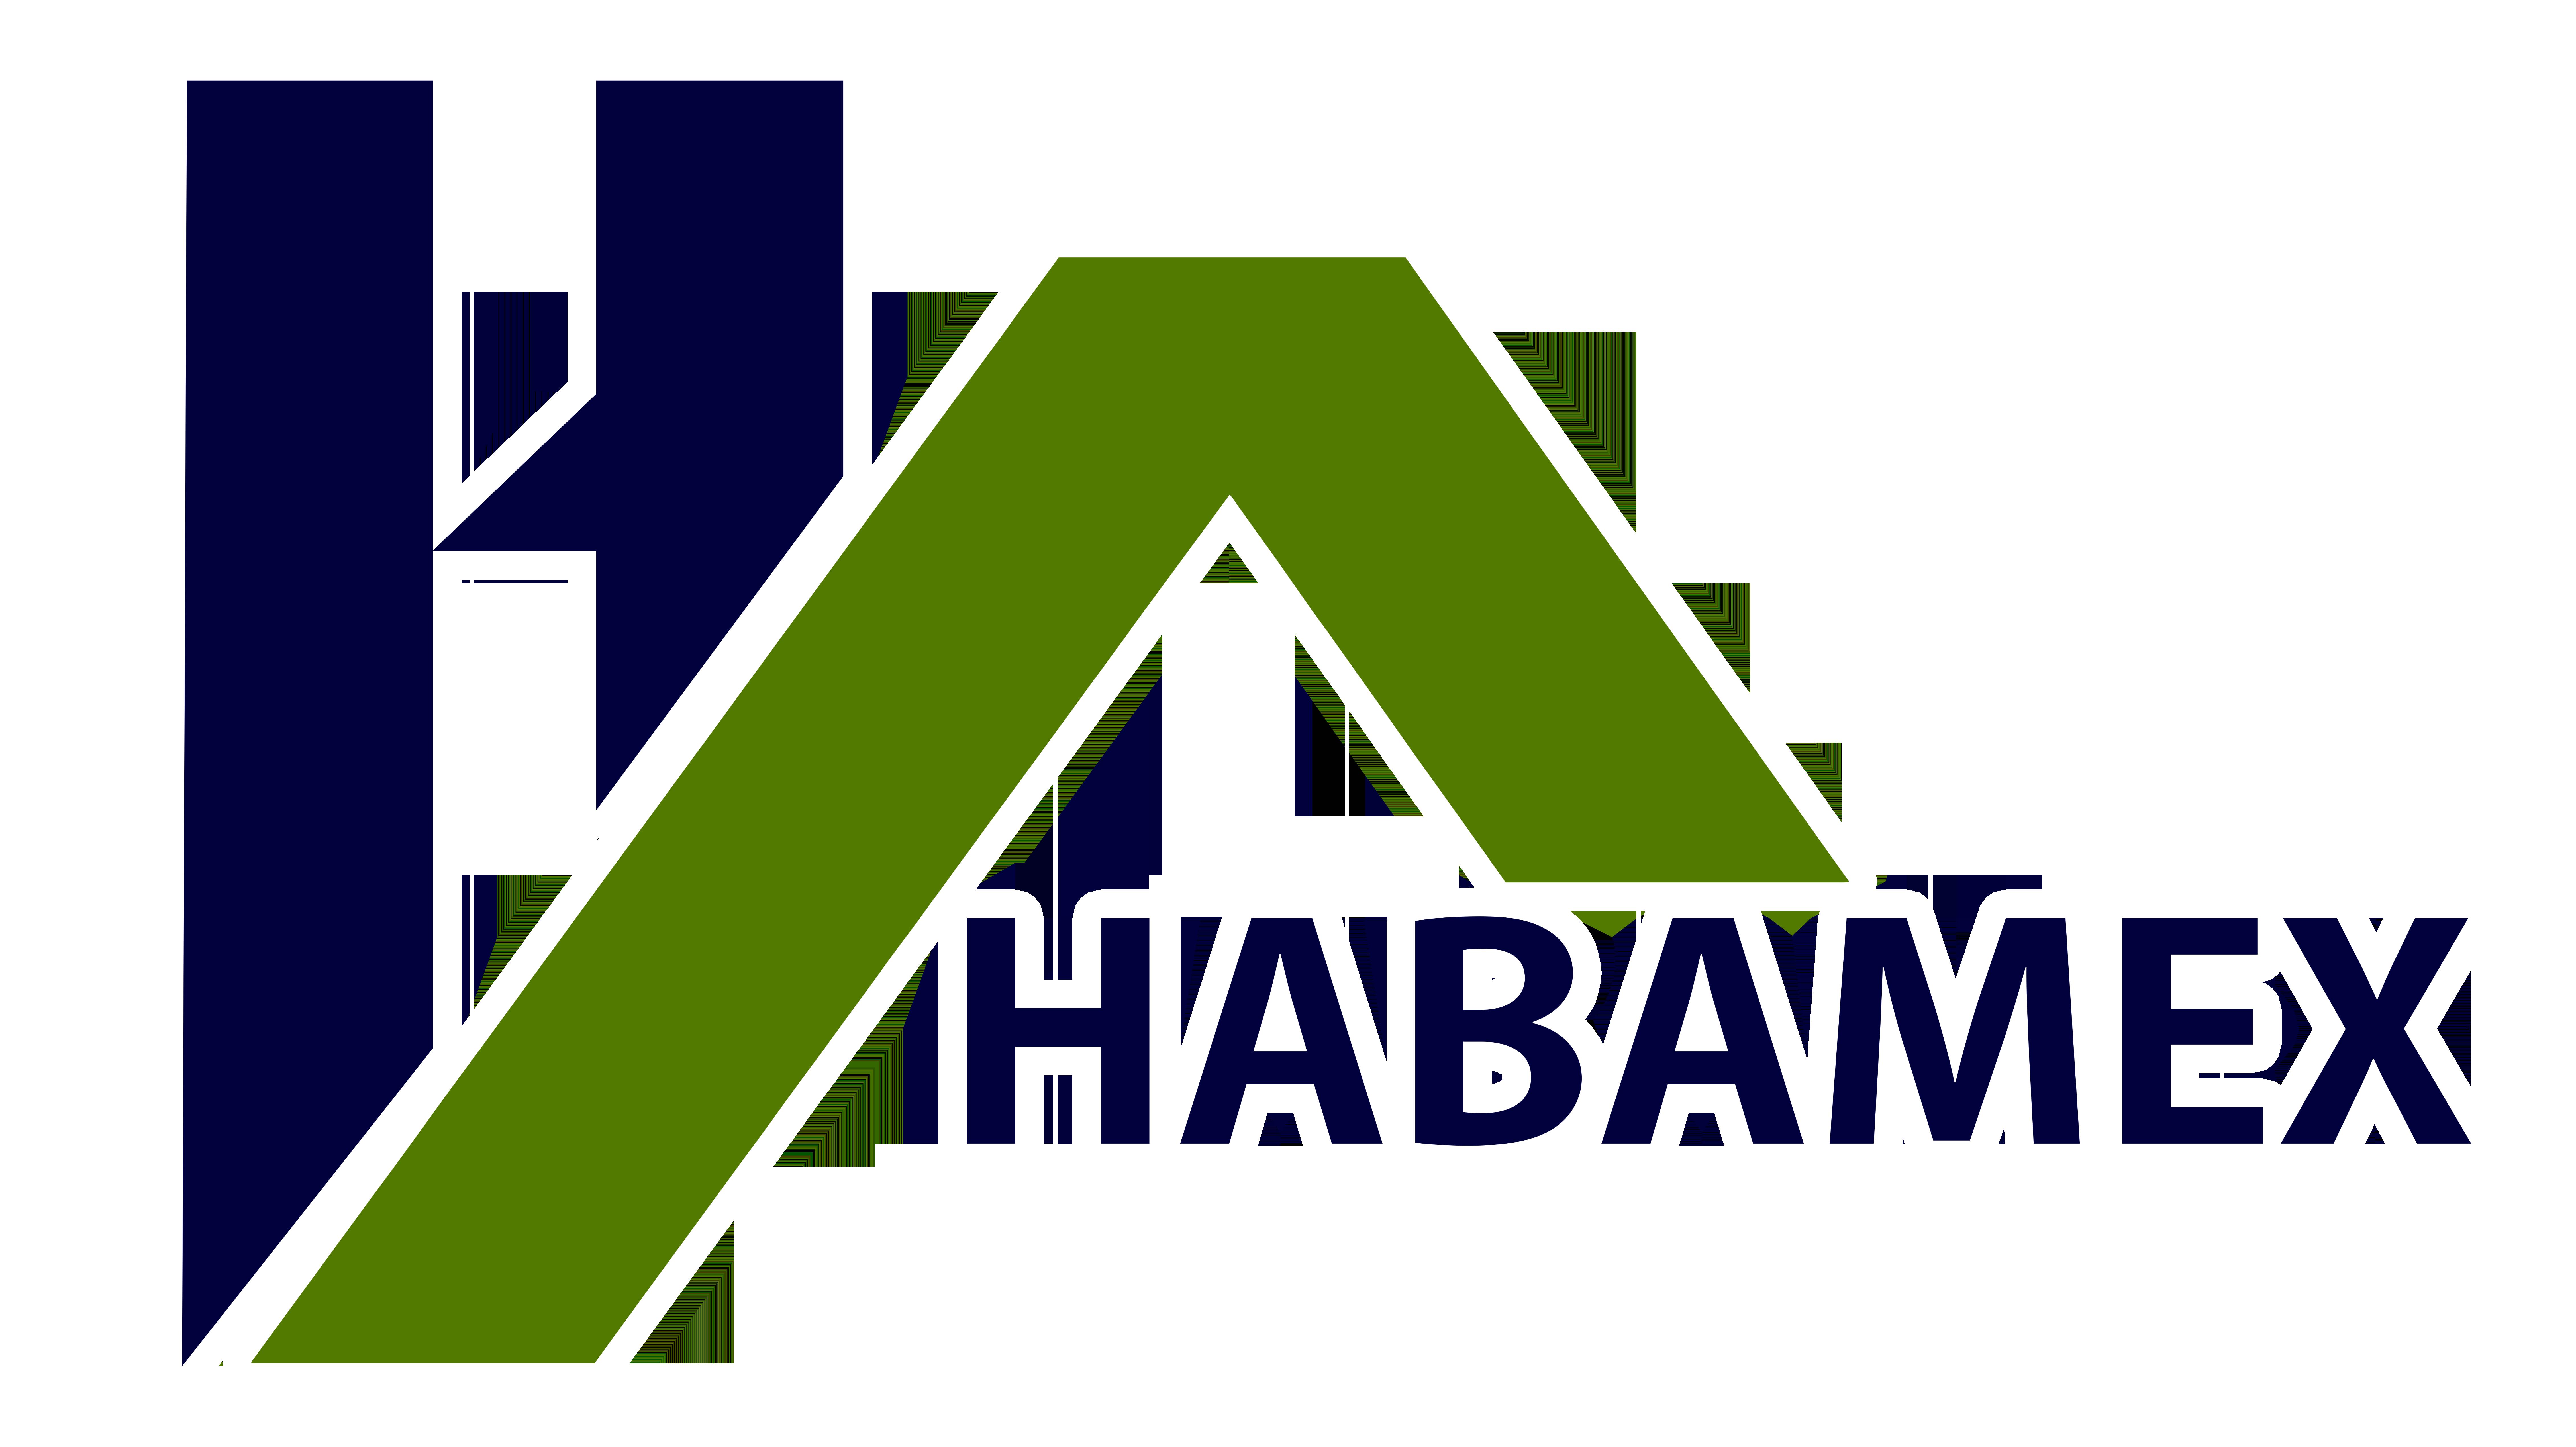 Logo habamex